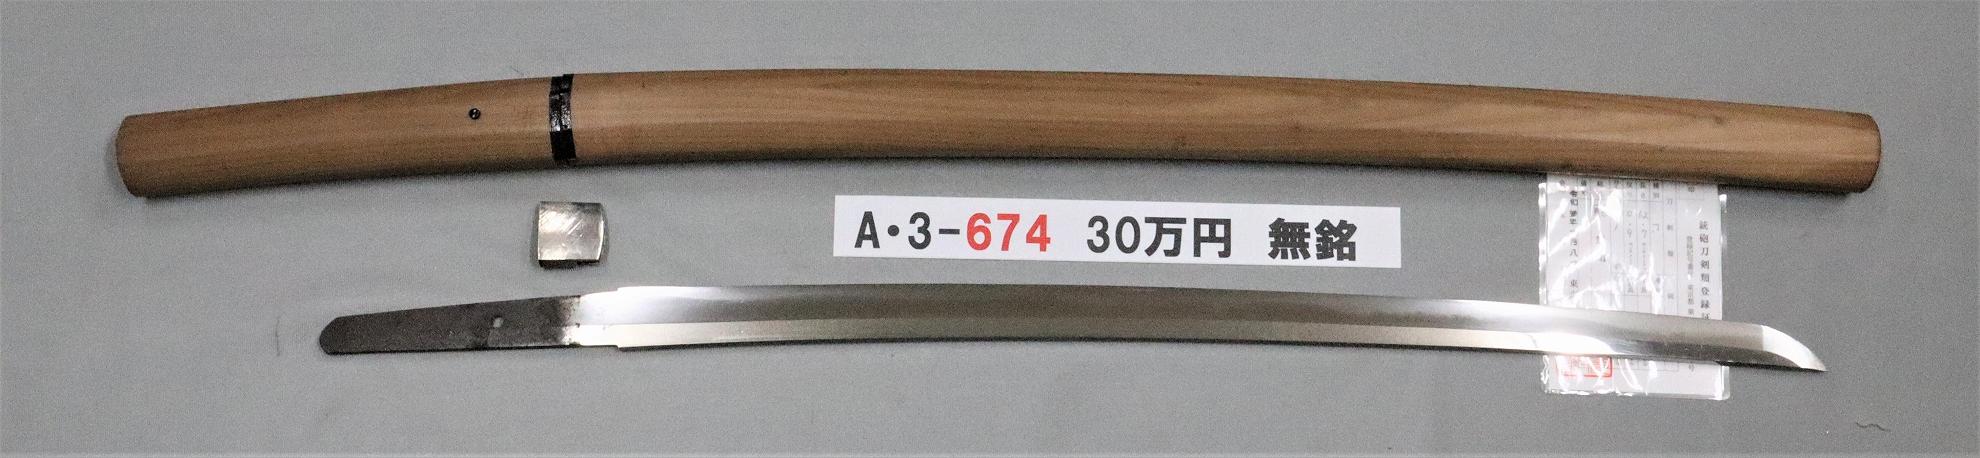 A3674